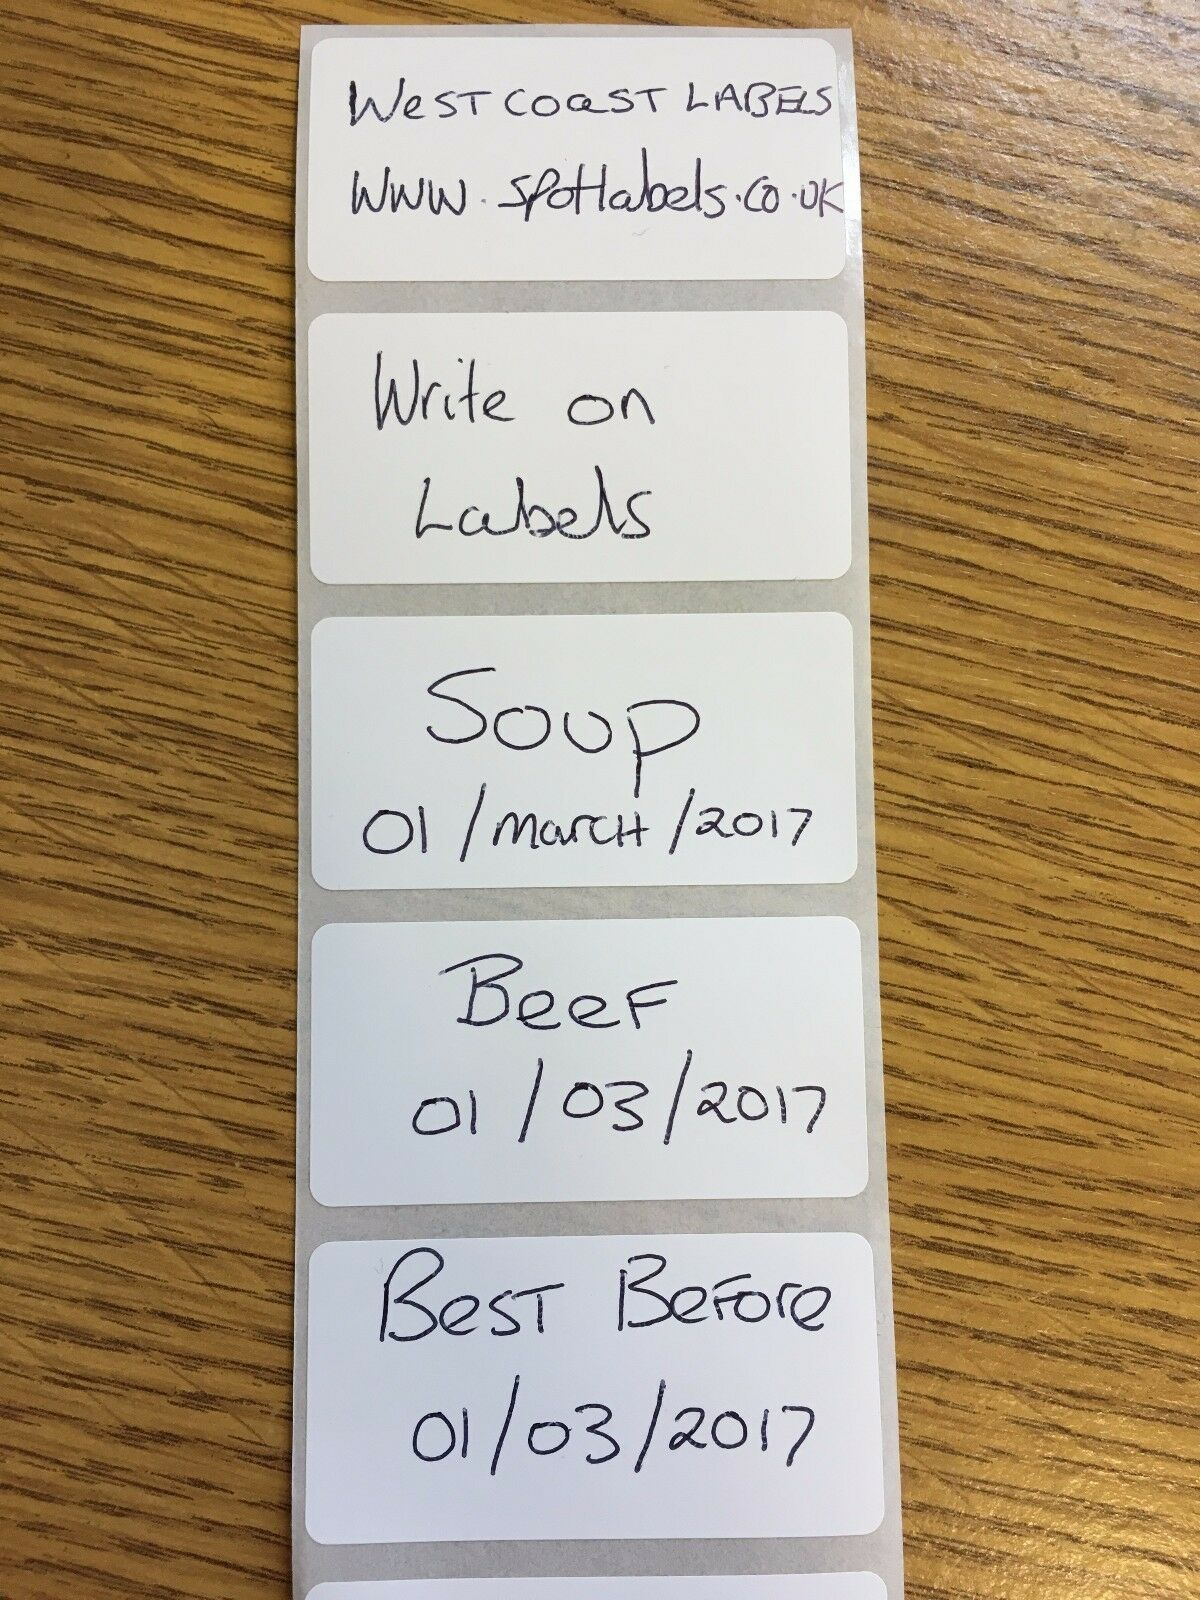 500 X size 50x50 FREEZER ADHESIVE FOOD LABELS WRITE ON FOOD LABELS  Food Storage